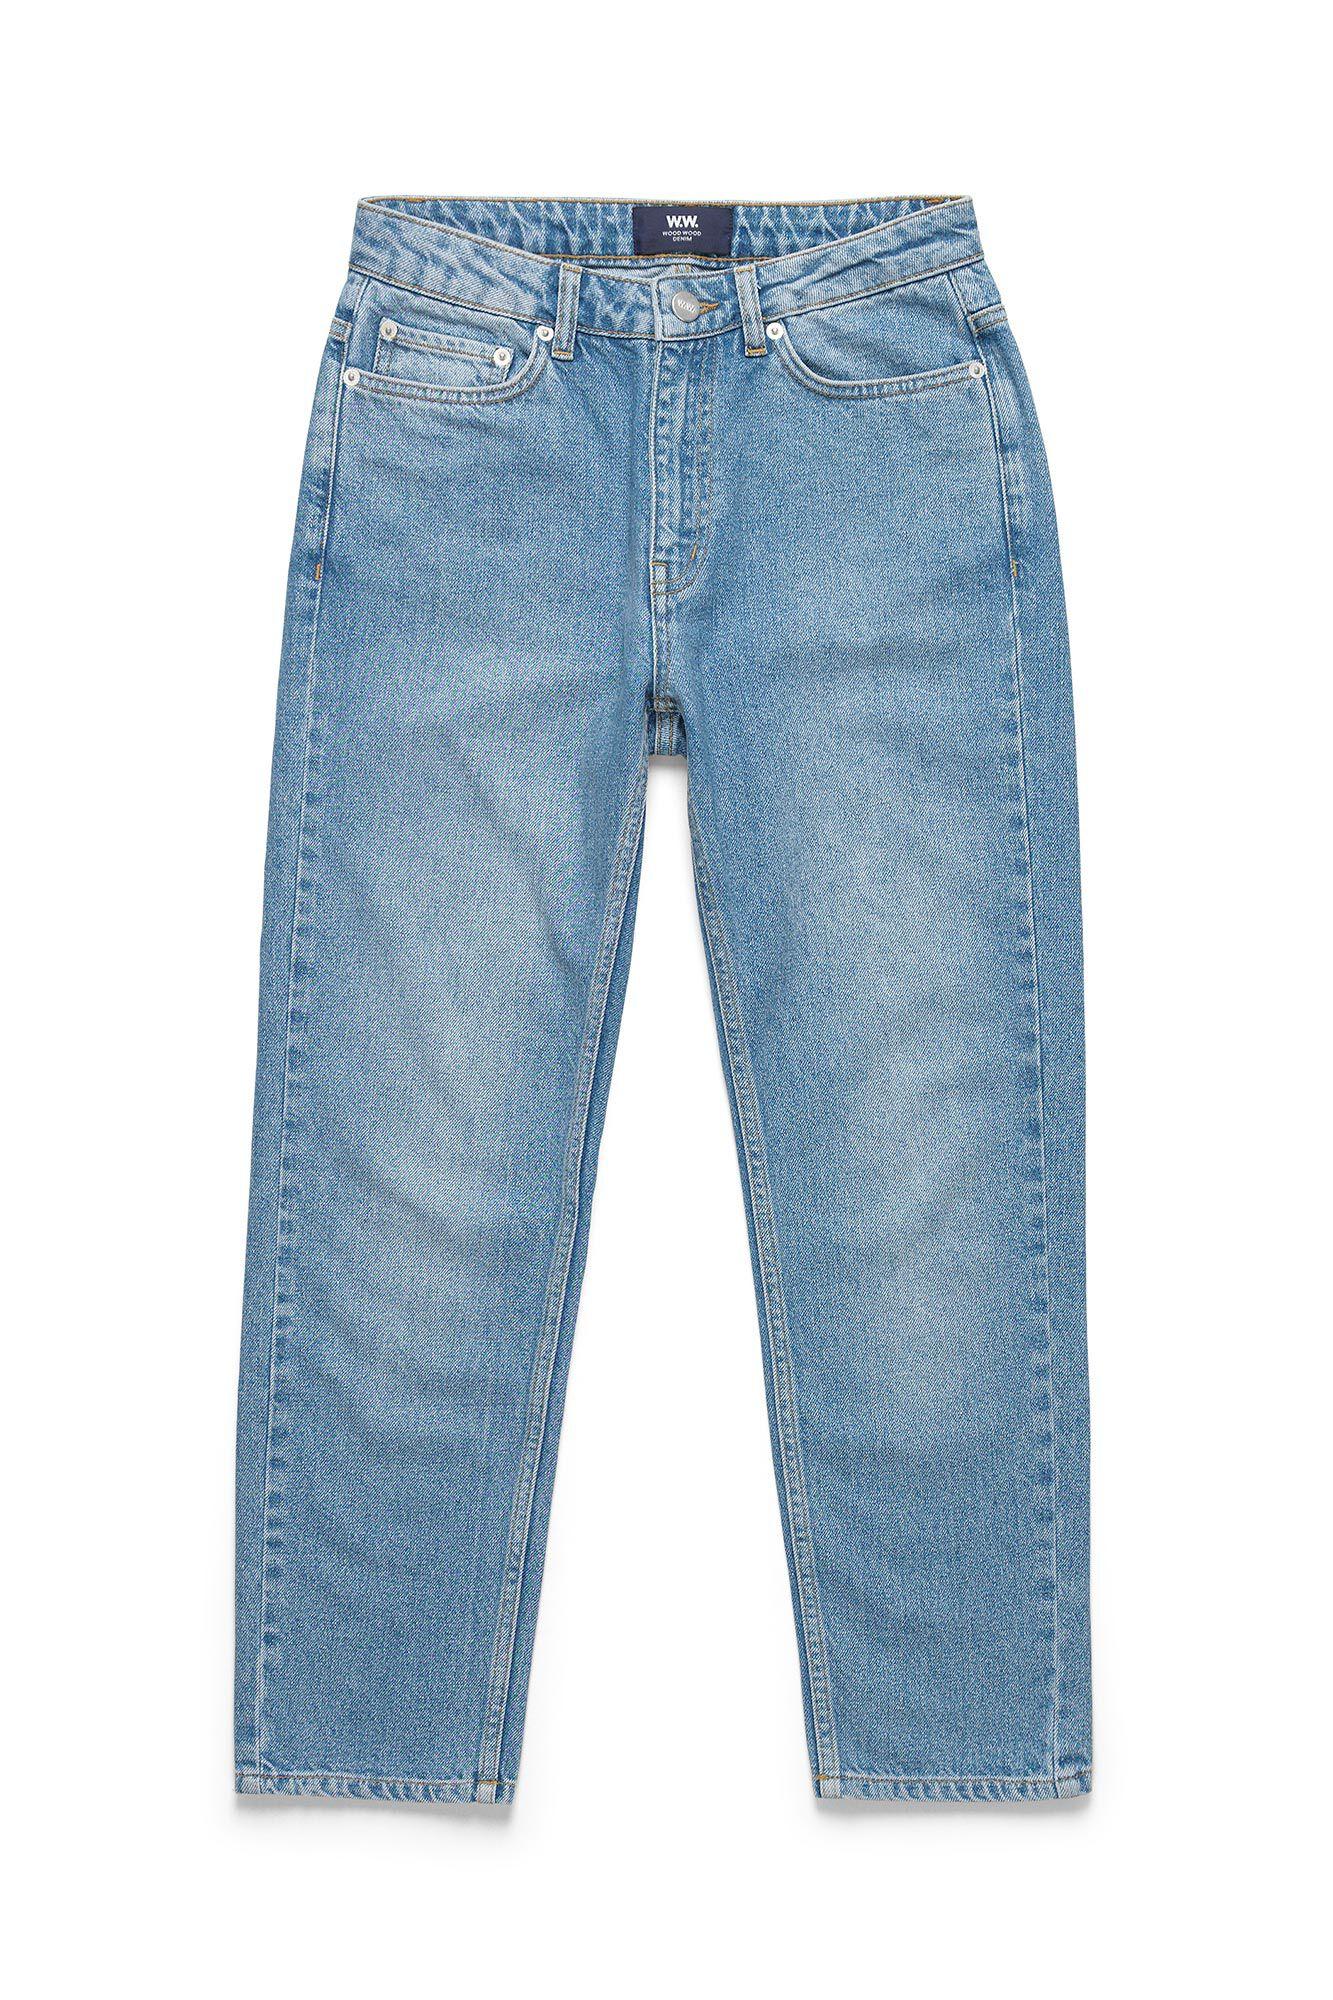 Eve Jeans 11611301-7006, CLASSIC BLUE VI